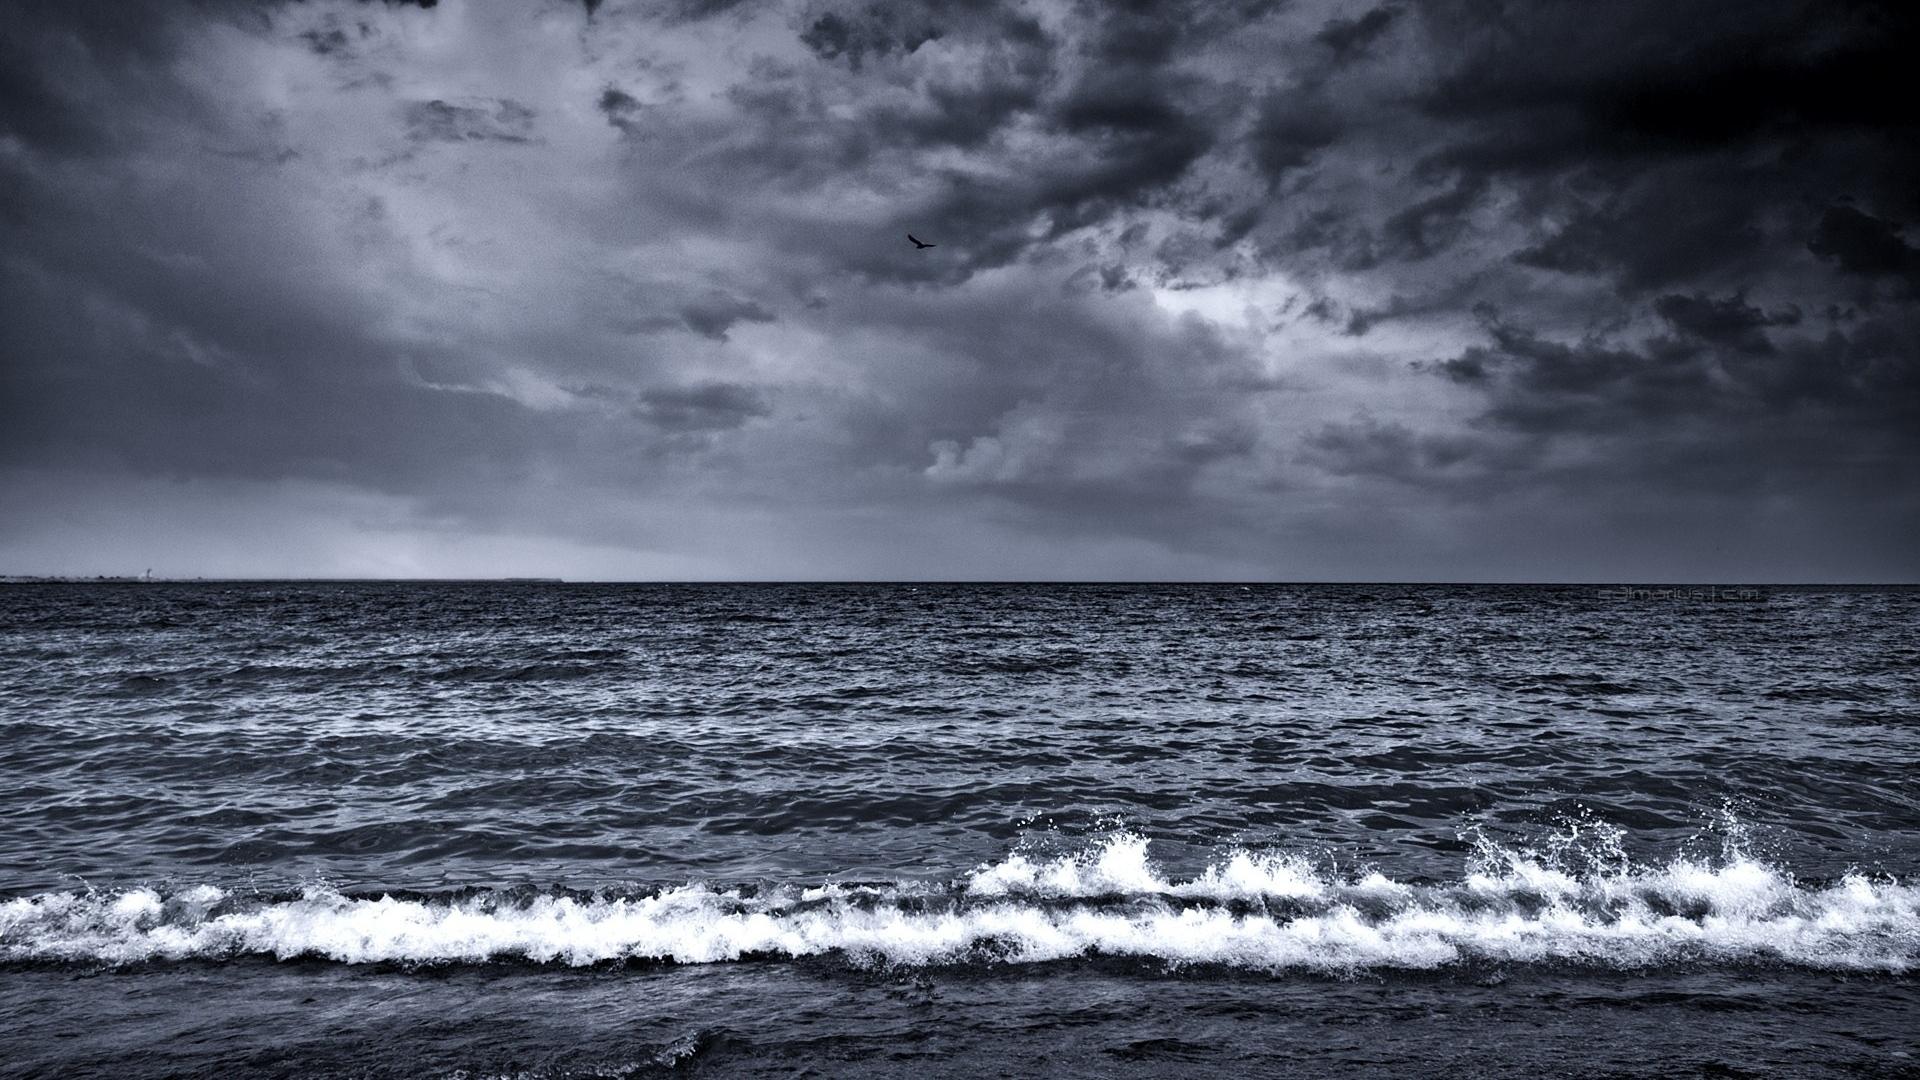 1920x1080-sea-waves-surf-foam-black-and-white-wallpaper-wp360912